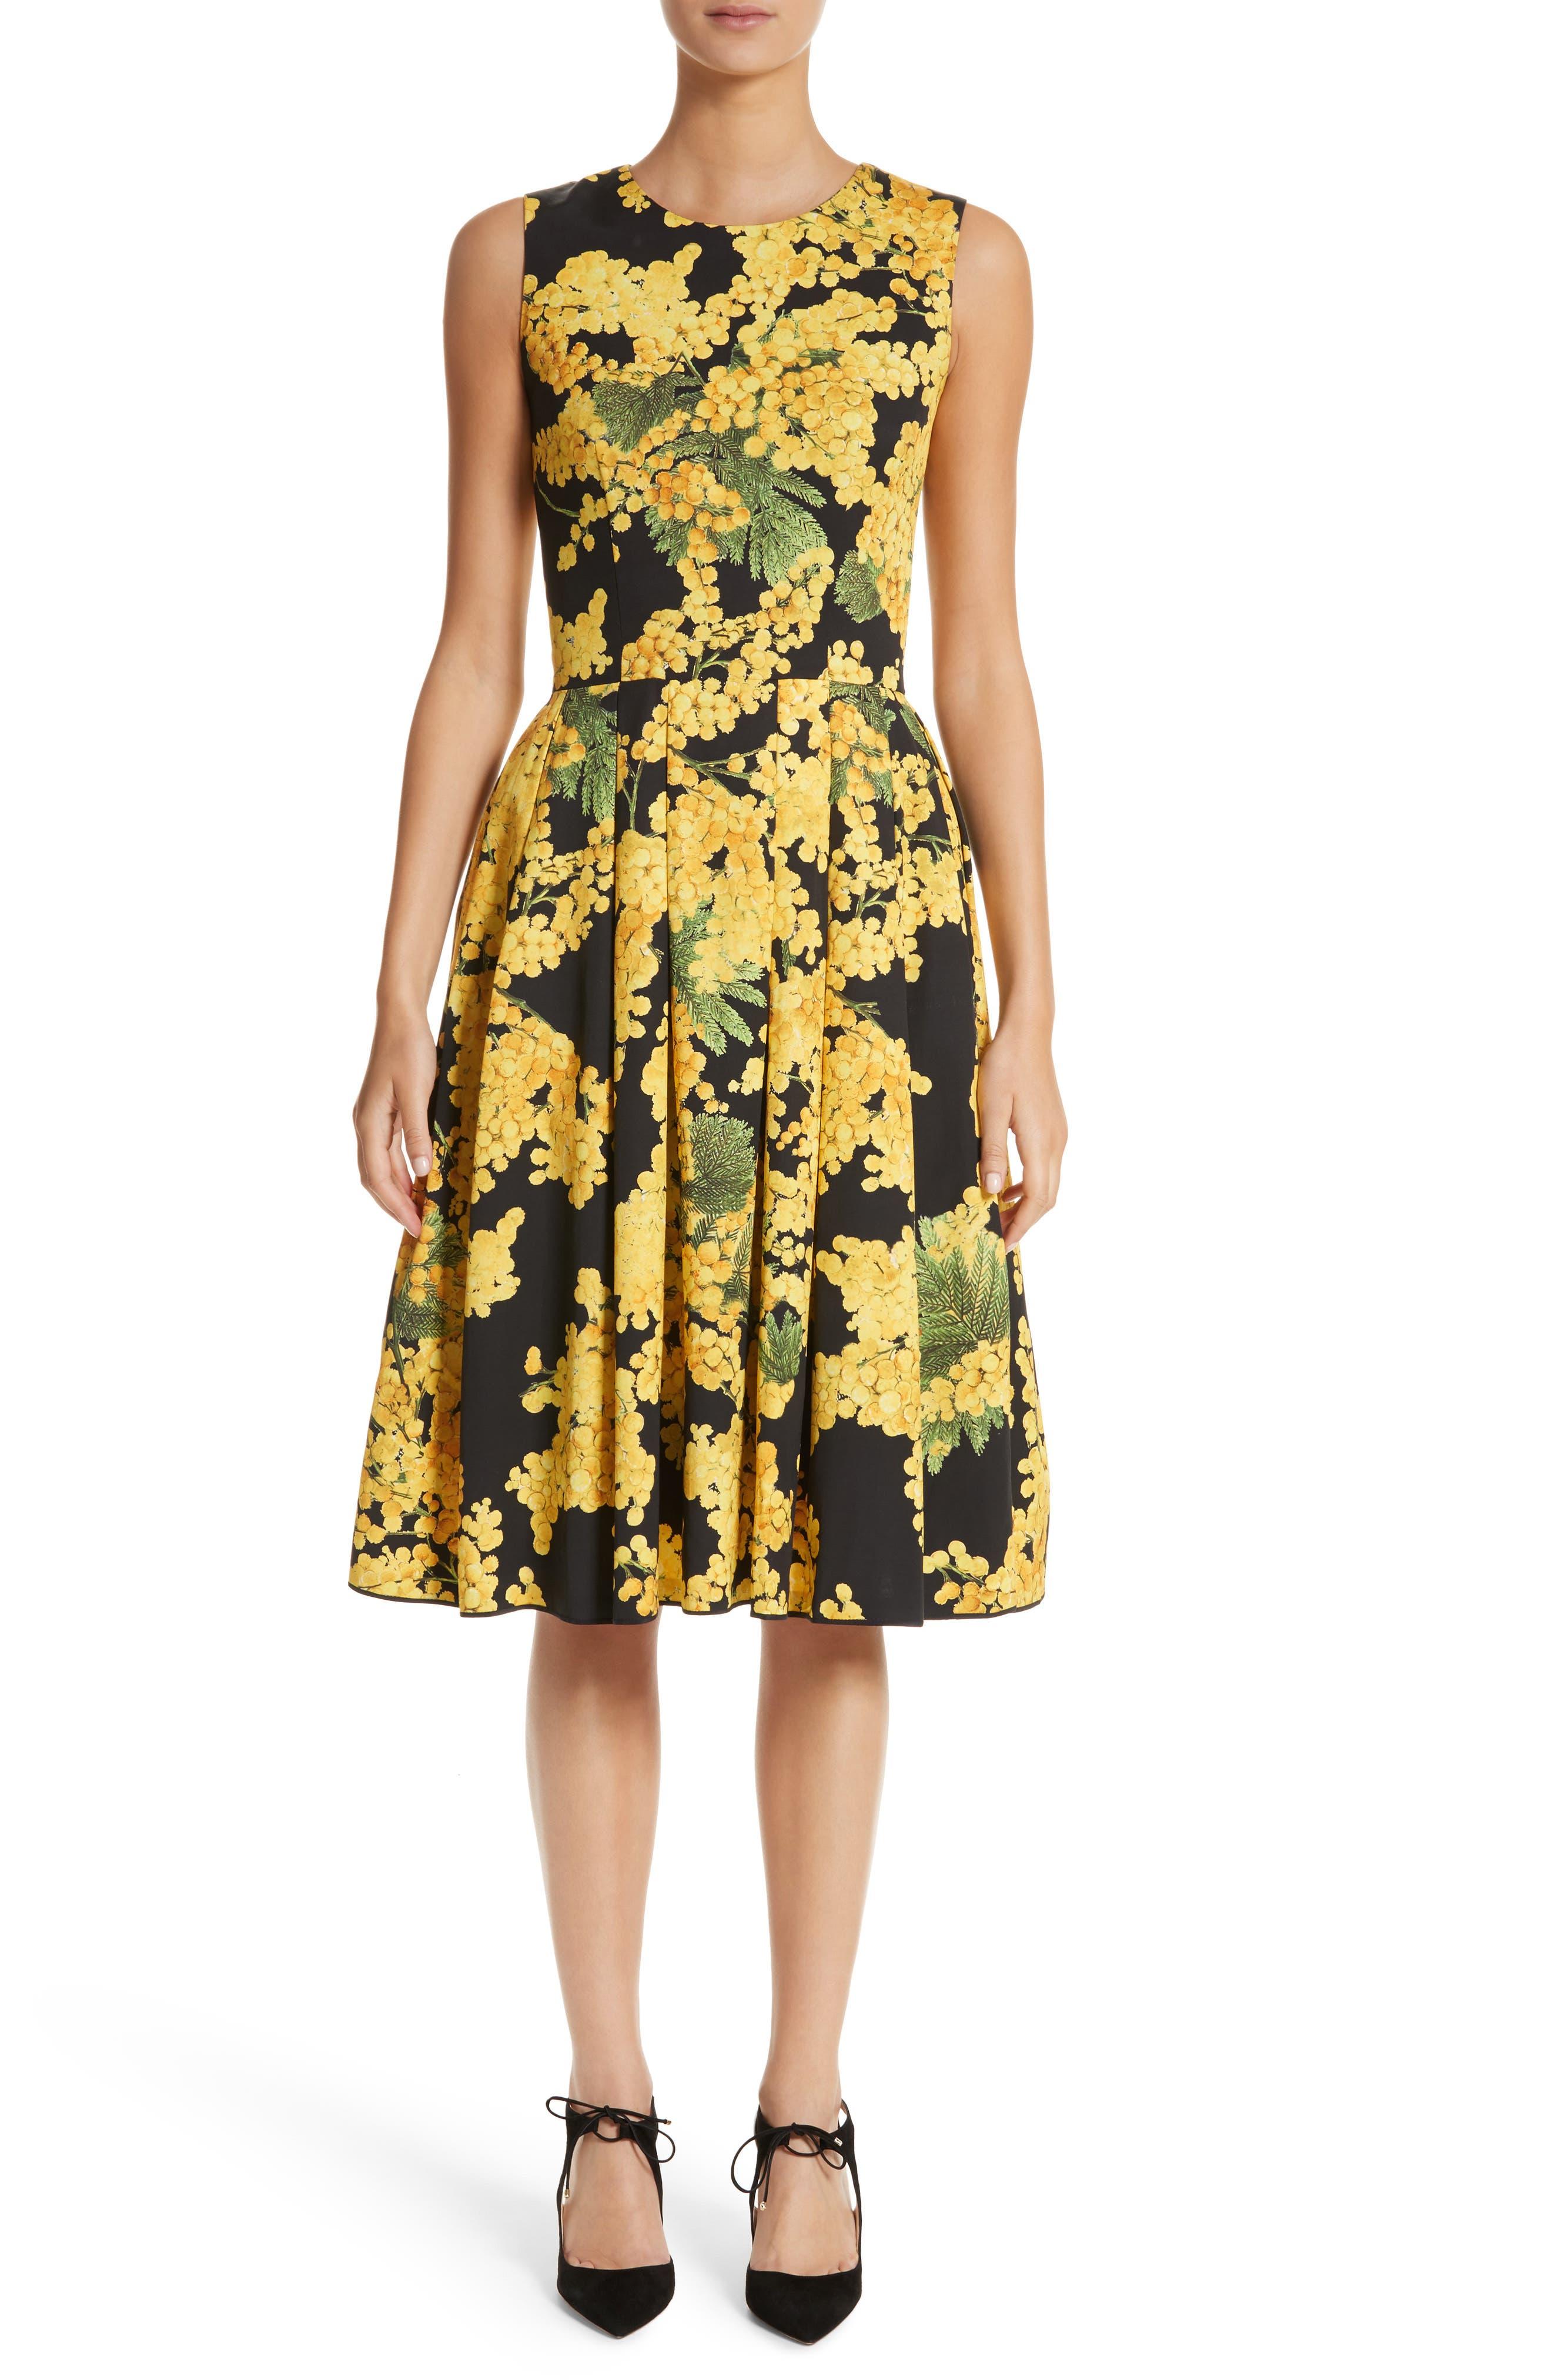 Floral Print Faille Day Dress,                             Main thumbnail 1, color,                             Freesia Yellow/Black